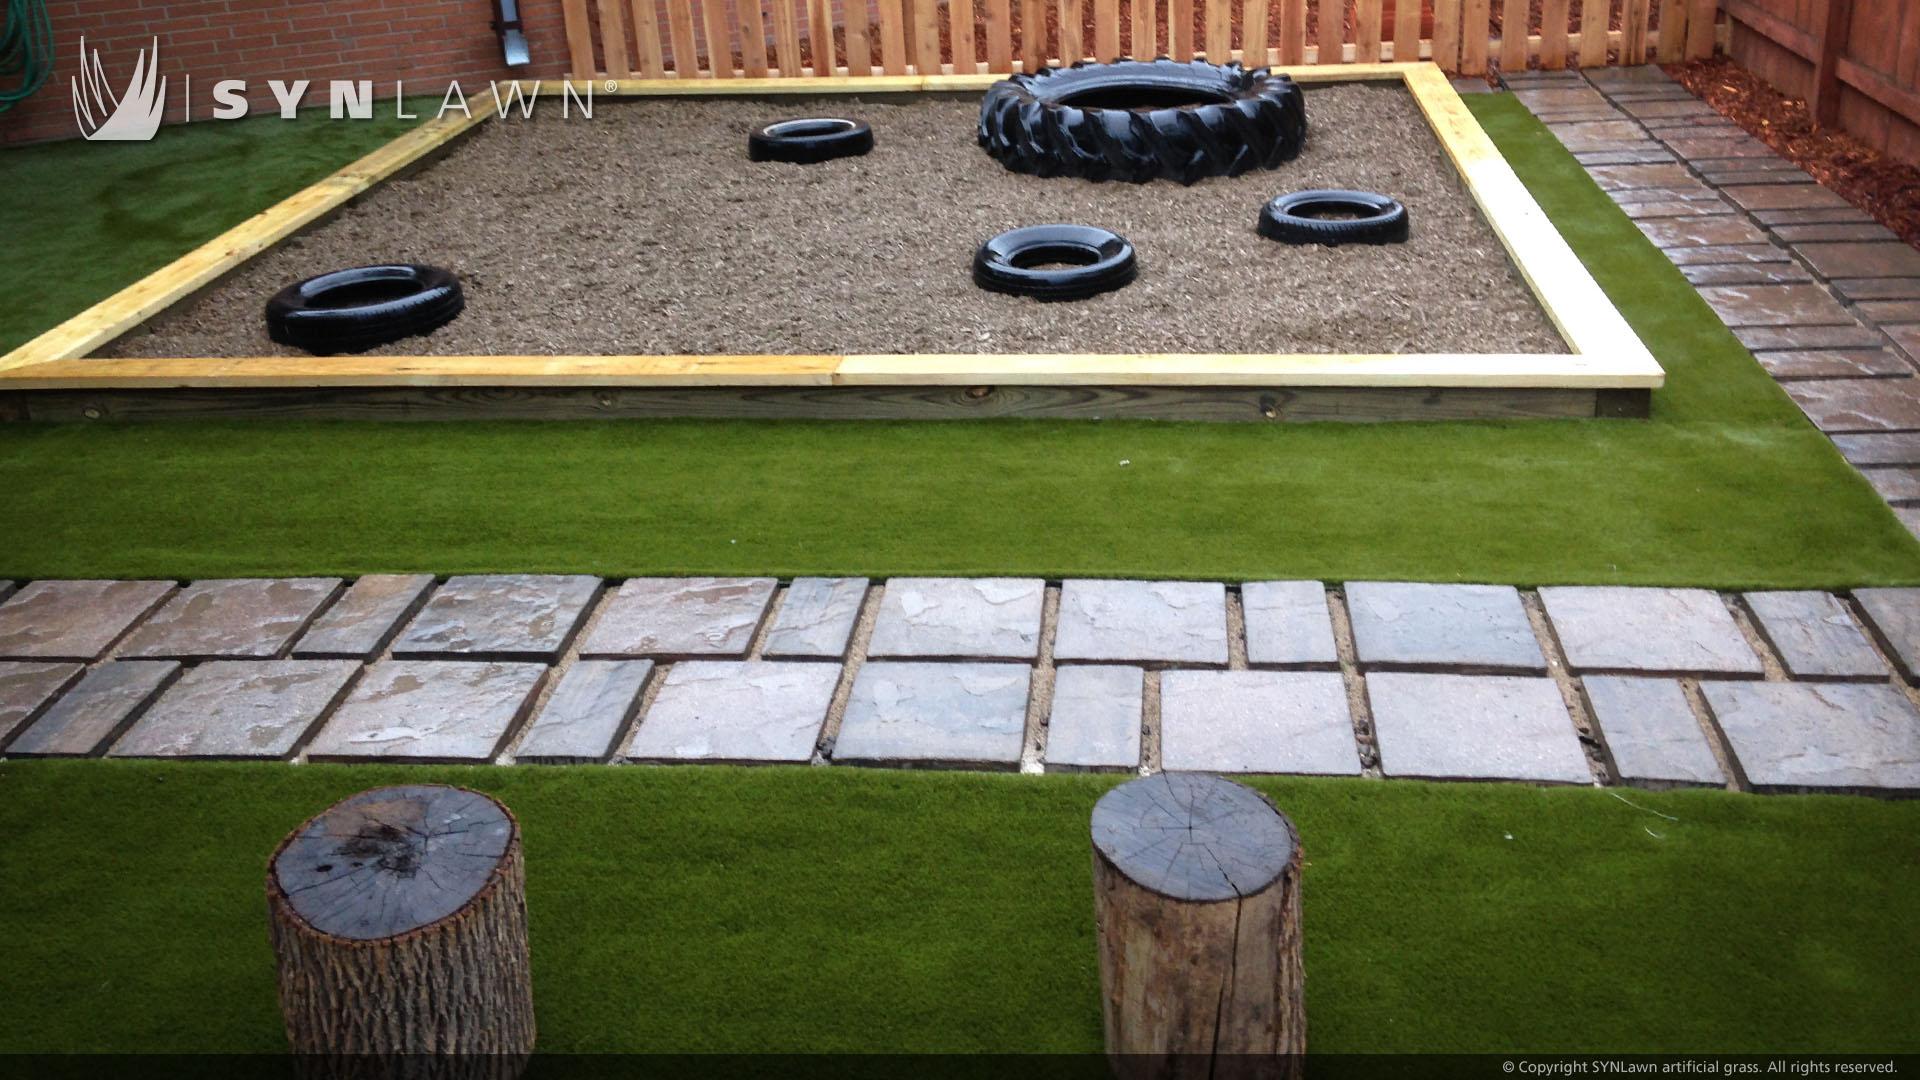 synlawn artificial grass play backyard sandbox